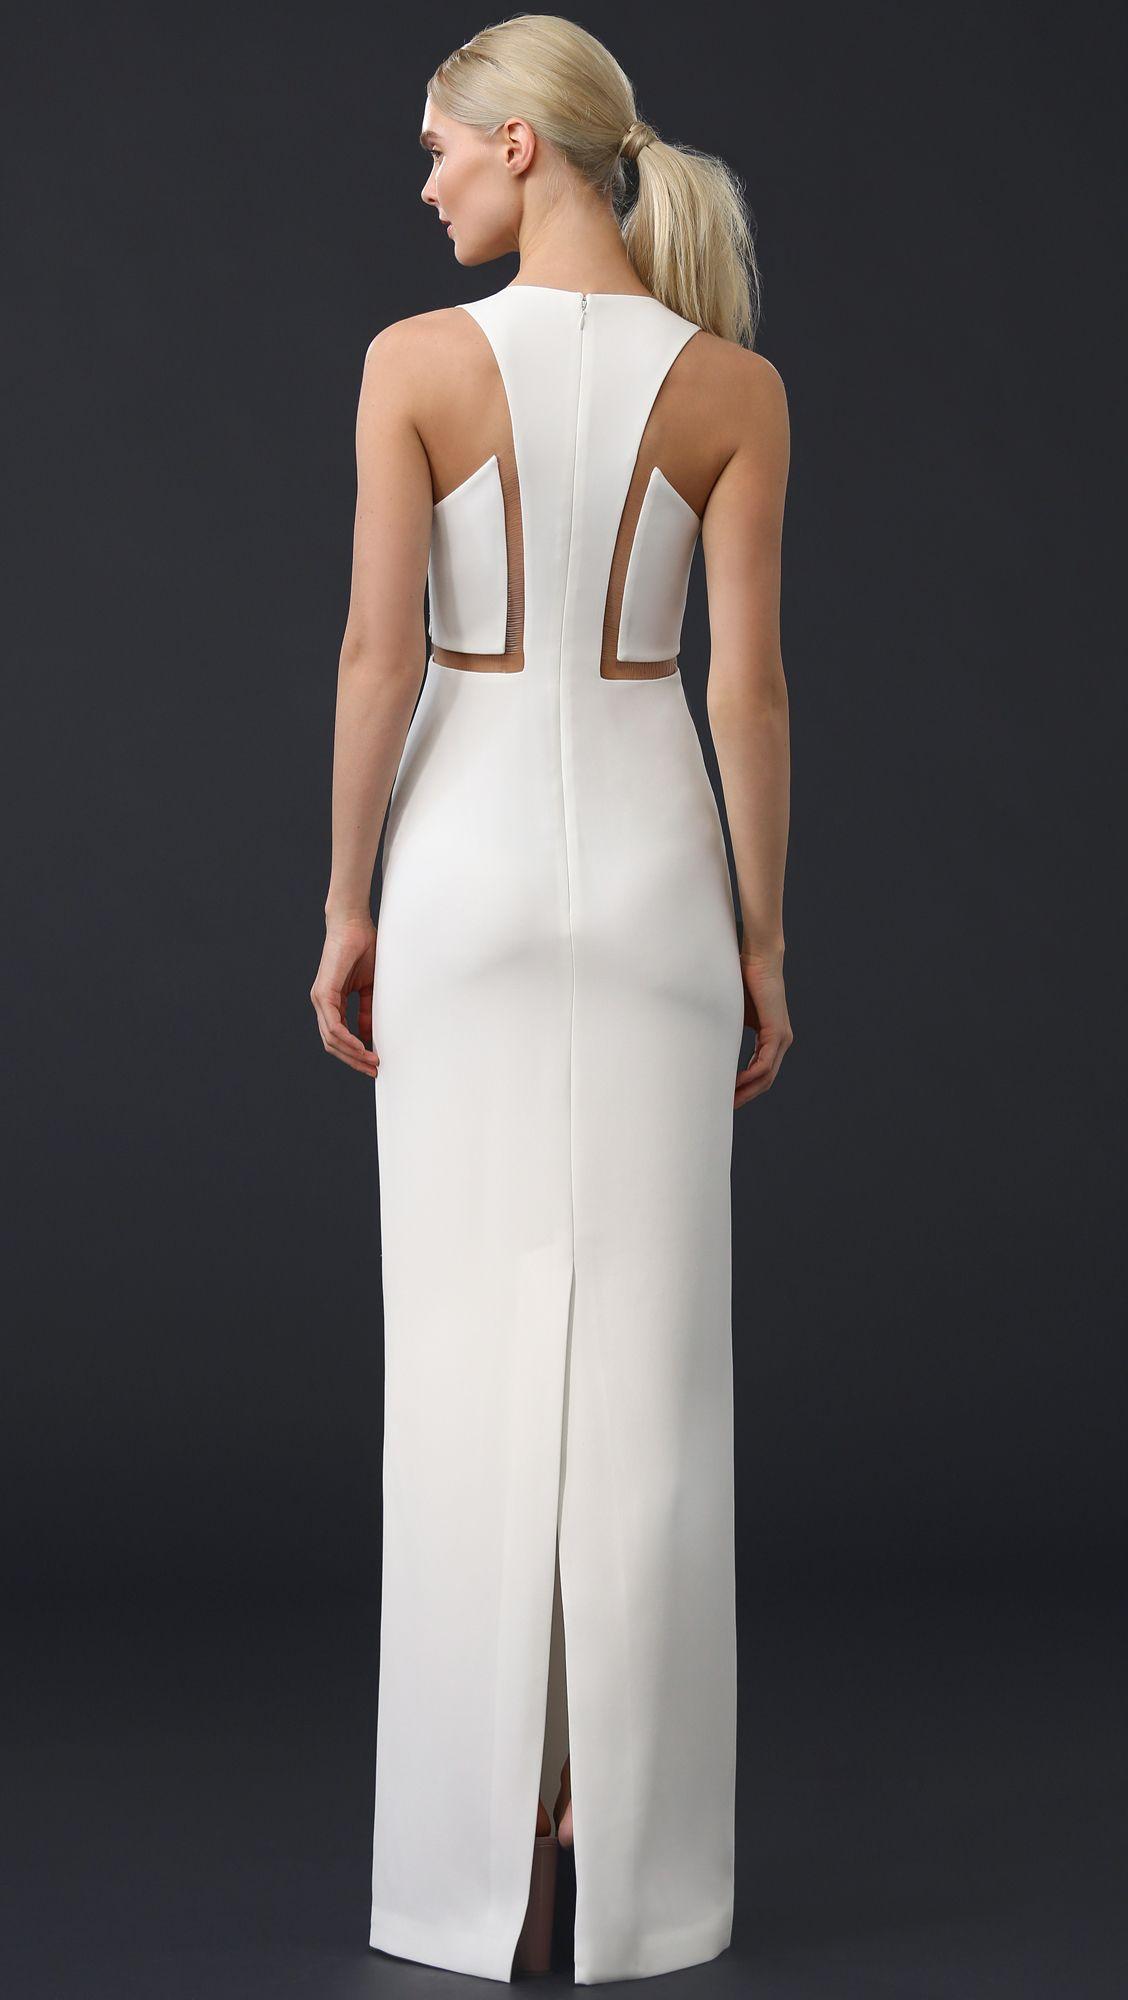 Alexander Wang White V Neck Gown With Fishing Line Detail Fashion Dresses Fashion Futuristic Fashion